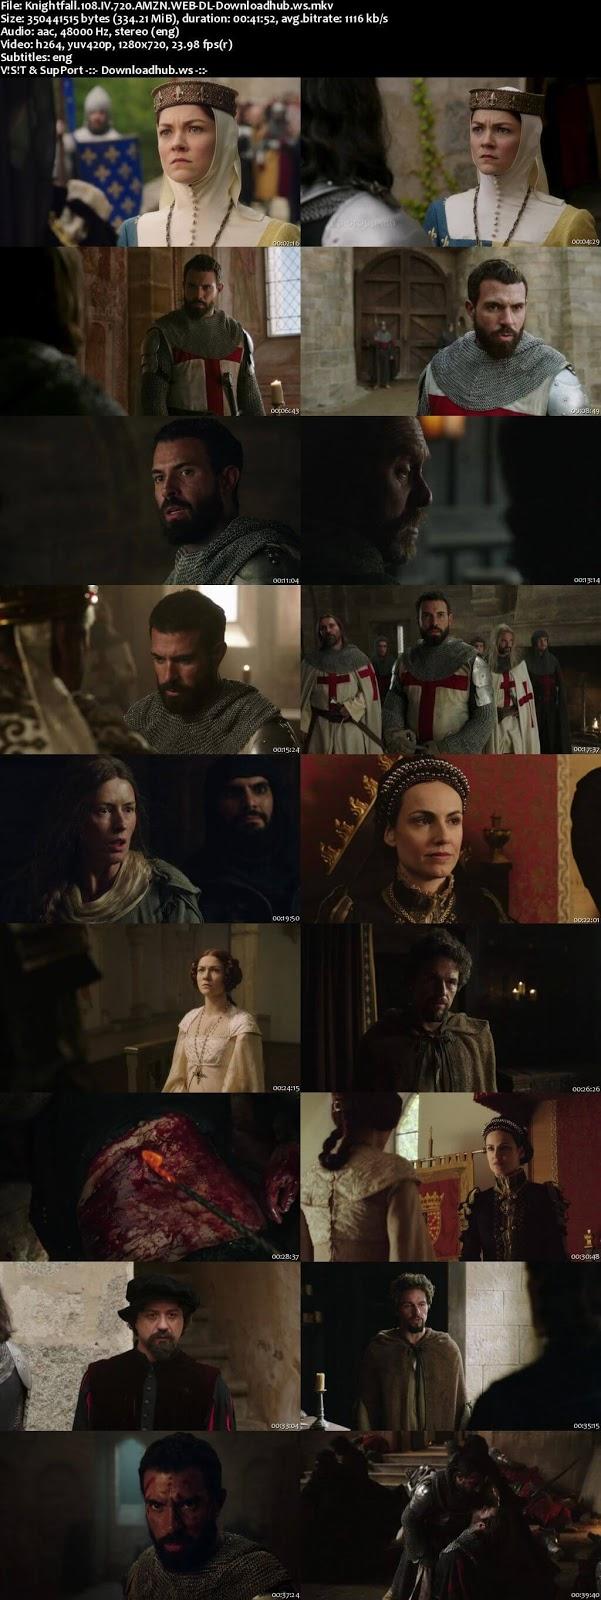 Knightfall S01E08 330MB WEB-DL 720p ESubs